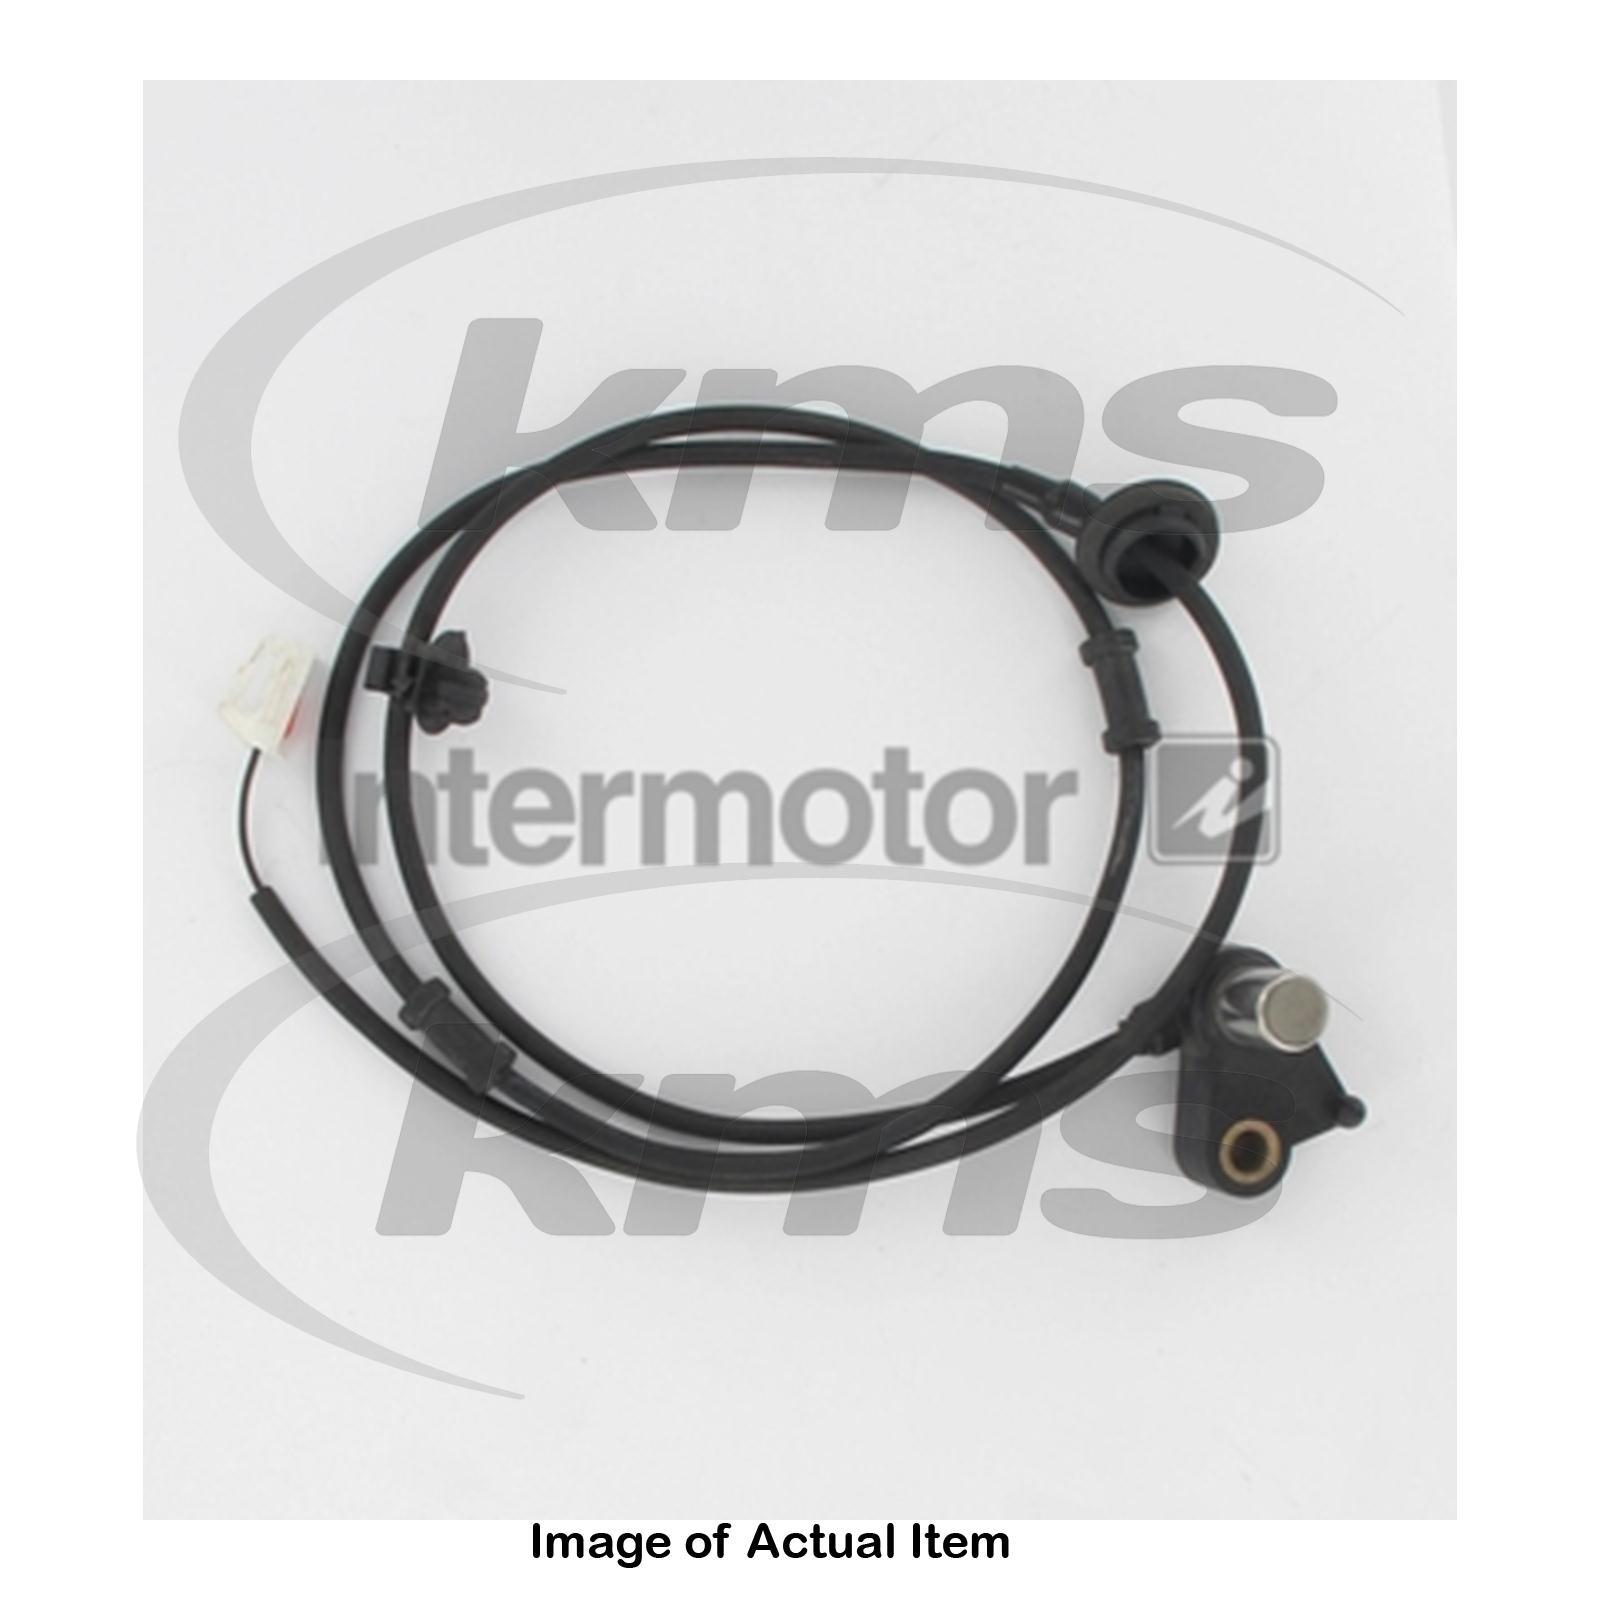 Intermotor Front ABS Wheel Speed Sensor Anti-Lock Brake Genuine OE Quality